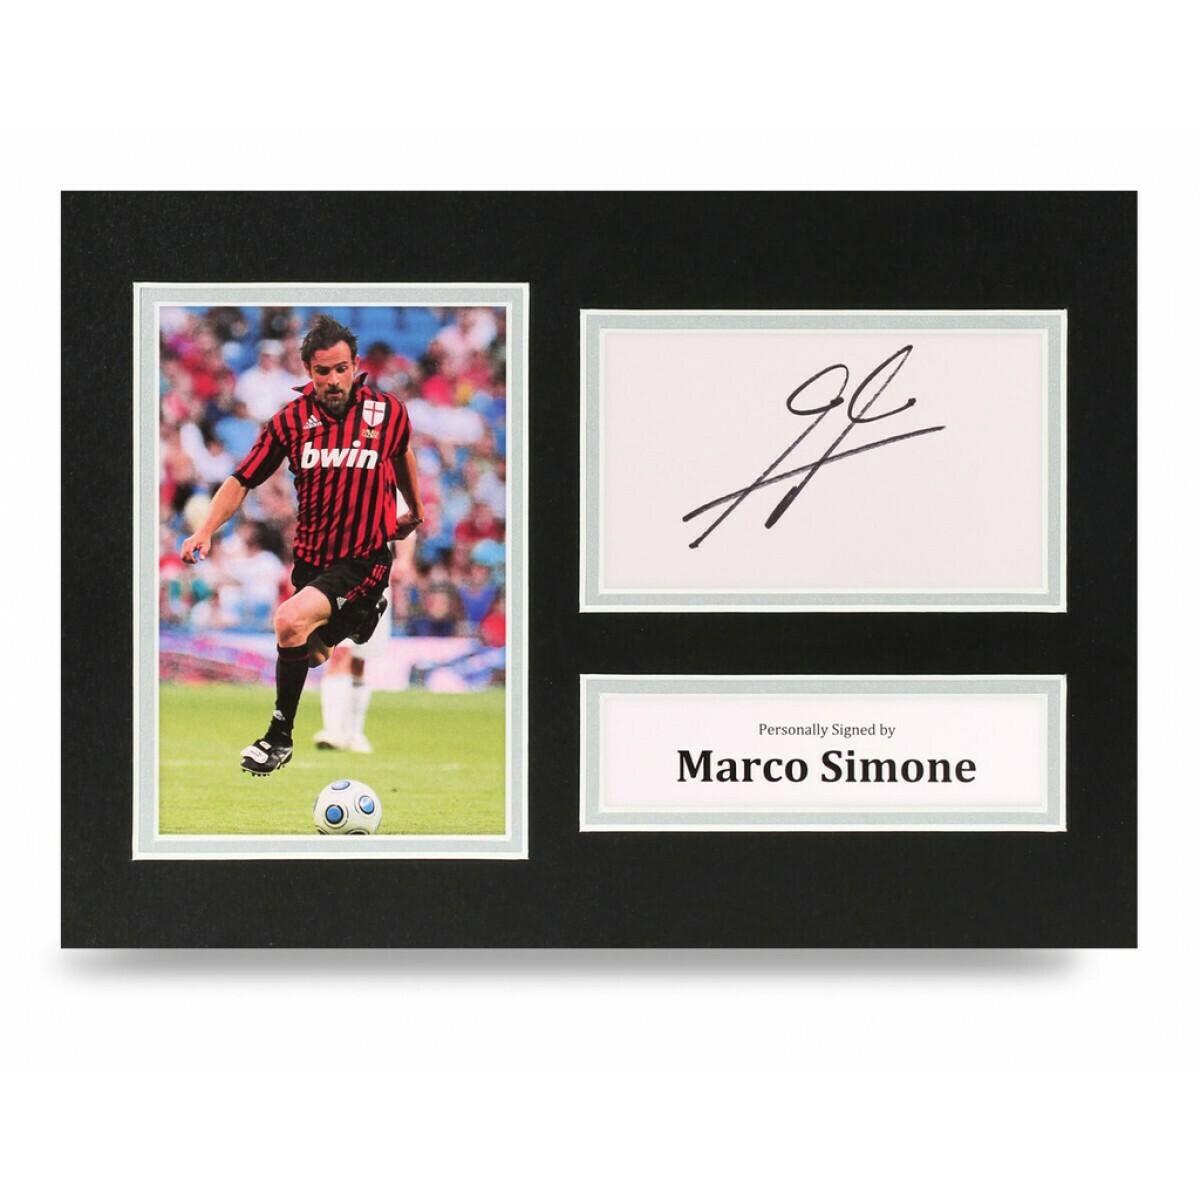 MARCO SIMONE  DISPLAY  AUTOGRAFATA SIGNED AUTOGRAPH SIGNED SIMONE  SIGNED MILAN Formato A4